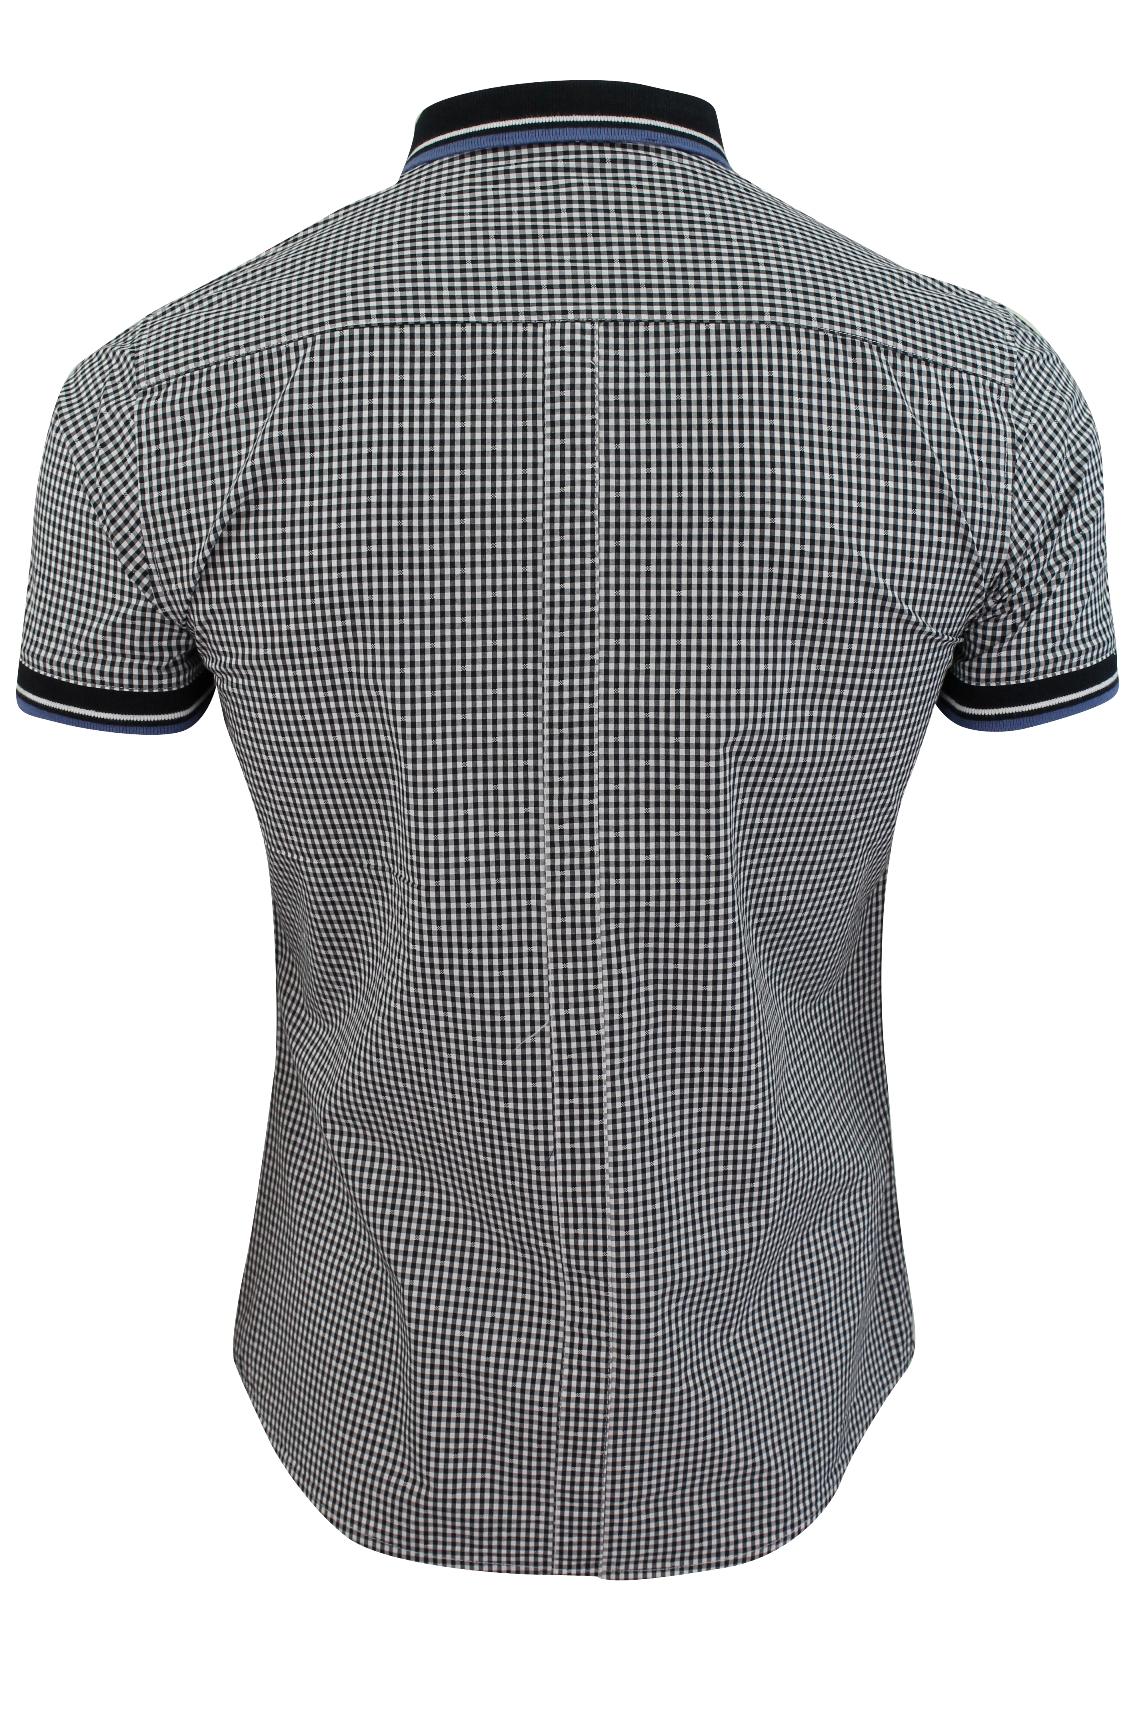 Mens-Shirt-by-Le-Shark-039-Bohemian-039-Gingham-Check thumbnail 8